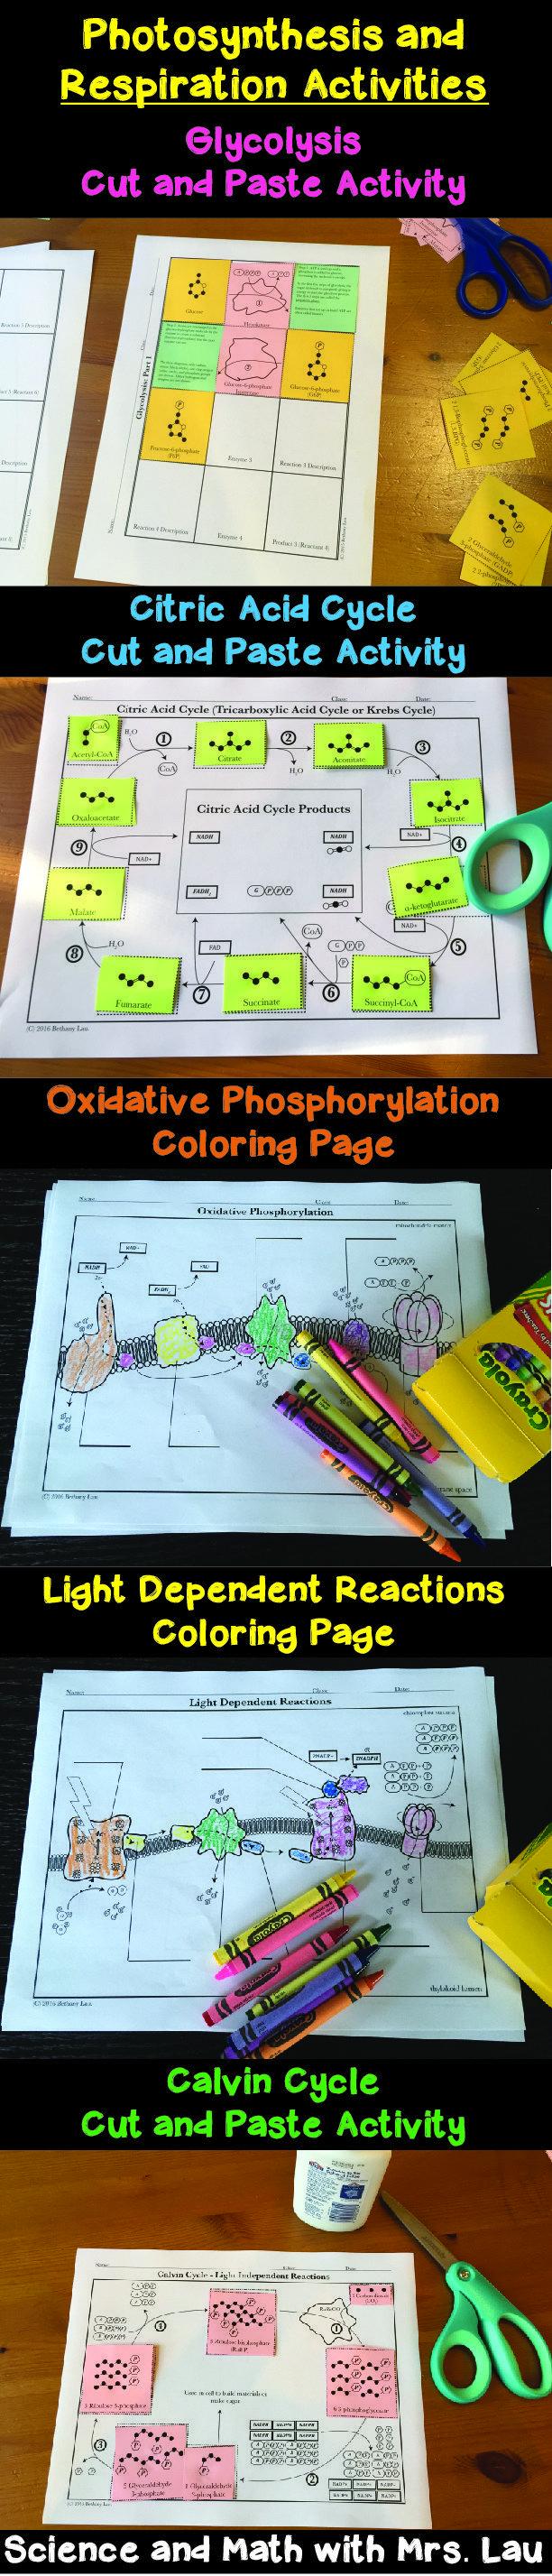 photosynthesis respiration activities